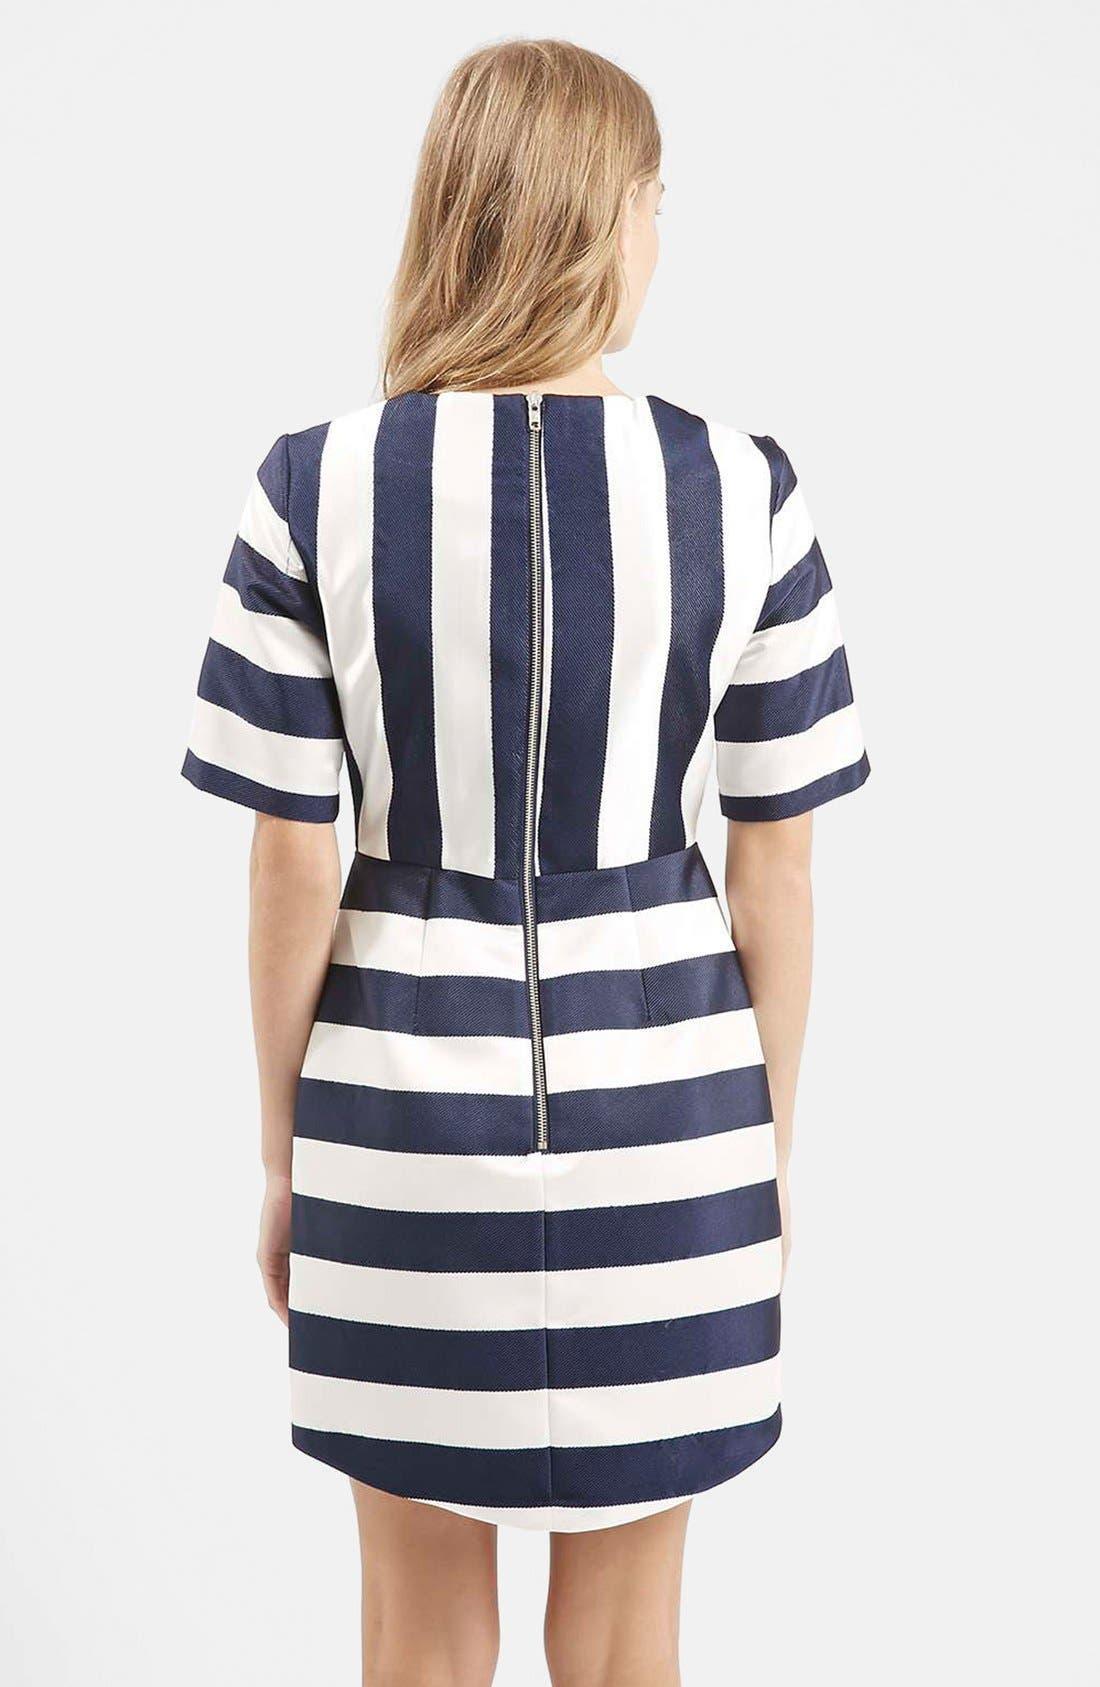 TOPSHOP, Twill & Satin Stripe Dress, Alternate thumbnail 4, color, 410